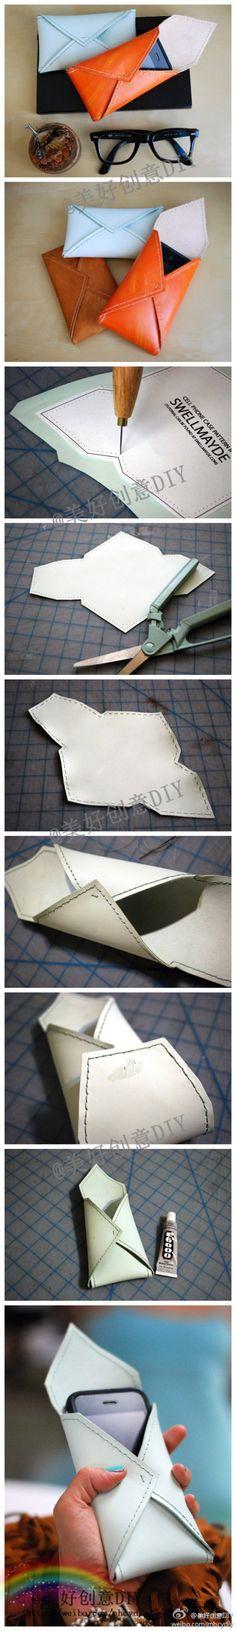 porta celular  molde: http://www.designsponge.com/wp-content/uploads/2011/09/swellmayde_pattern.pdf